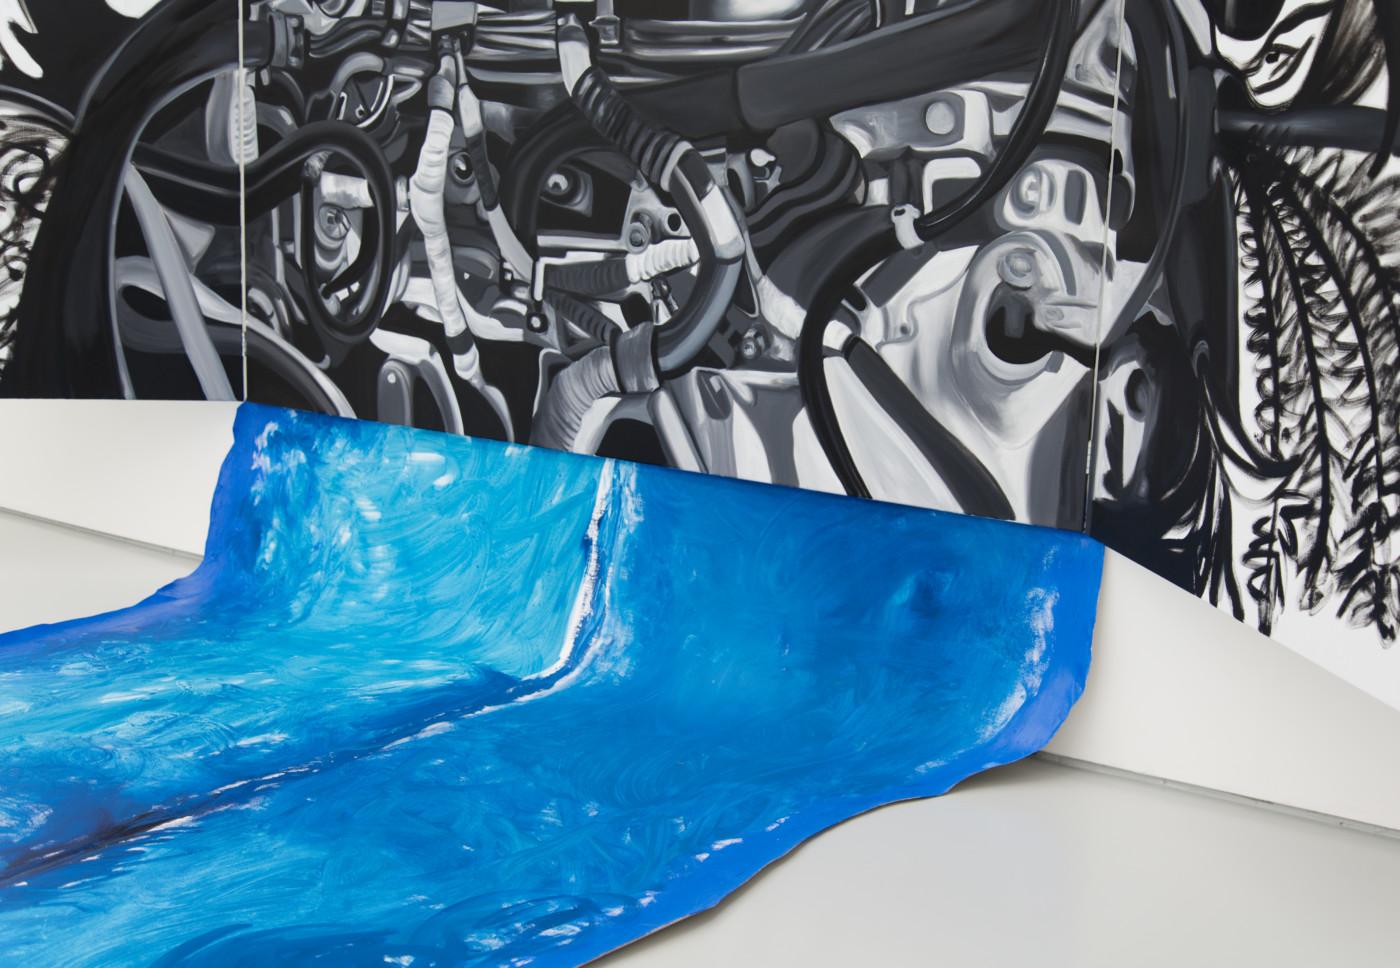 AUTOFELATIO  Autoeroticism  (detail), 2018 Oil on linen, hardware 279 x 289 cm / 109.8 x 113.8 in  Frieda Toranzo Jaeger